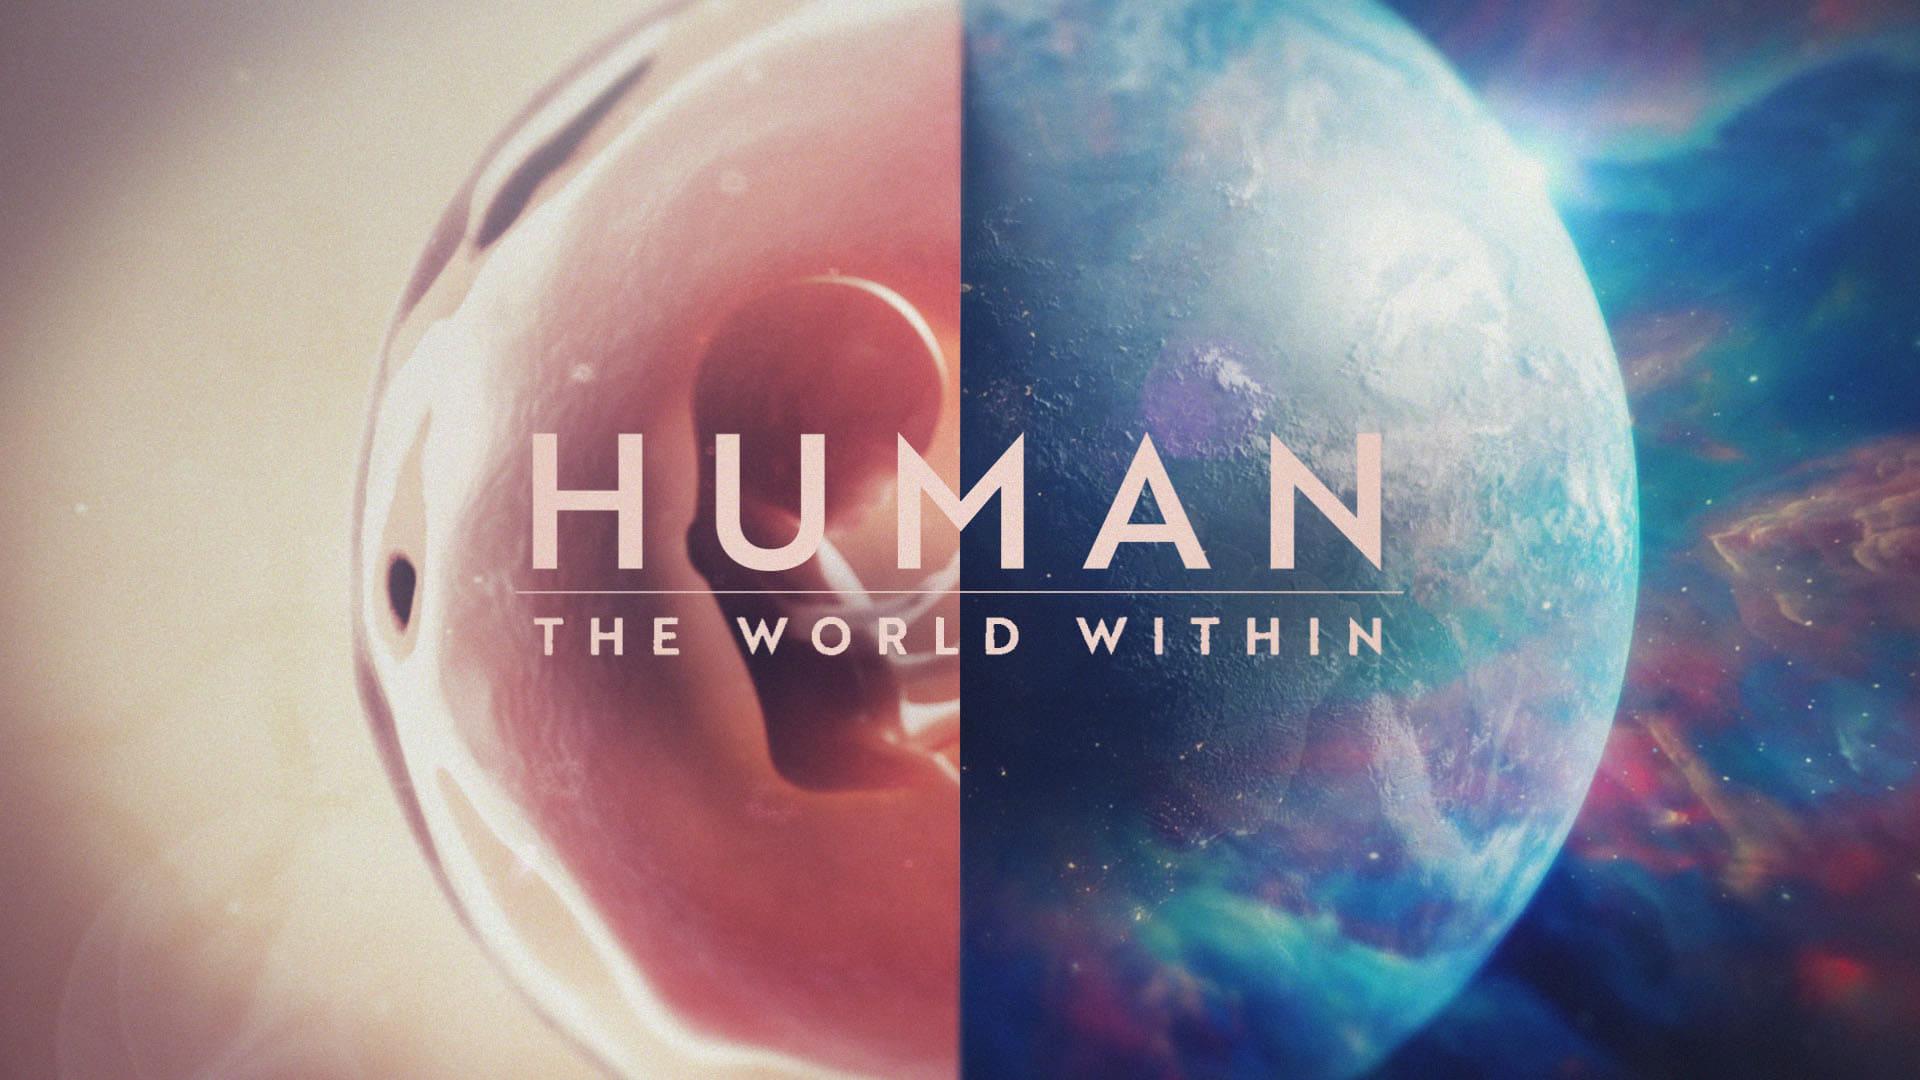 Cuerpo humano: Un mundo entrañable